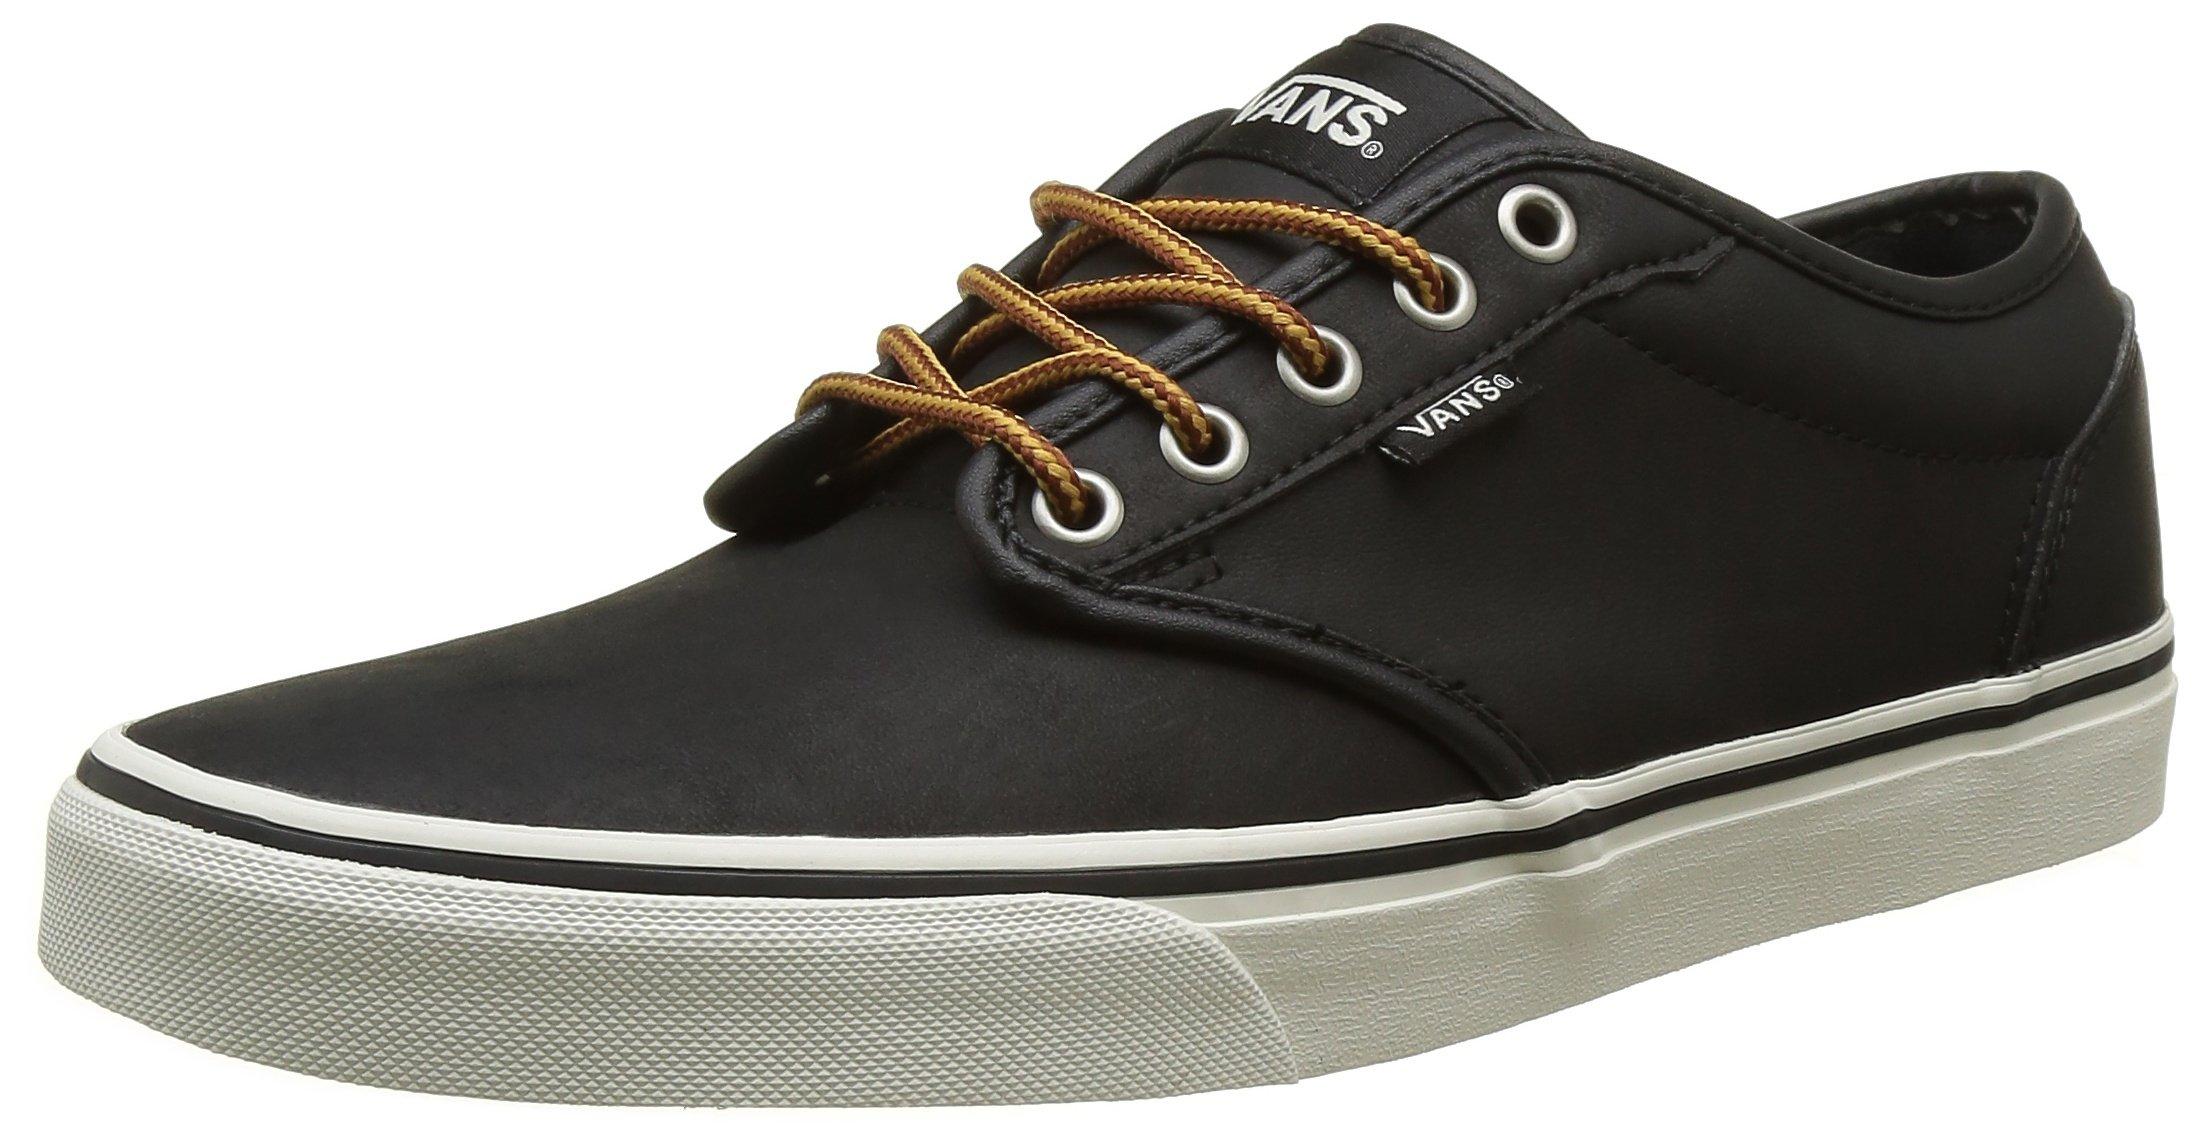 c4bbc1c7164db Vans Men's Atwood (Leather) Black/Marshmallow Skate Shoe 13 Men US